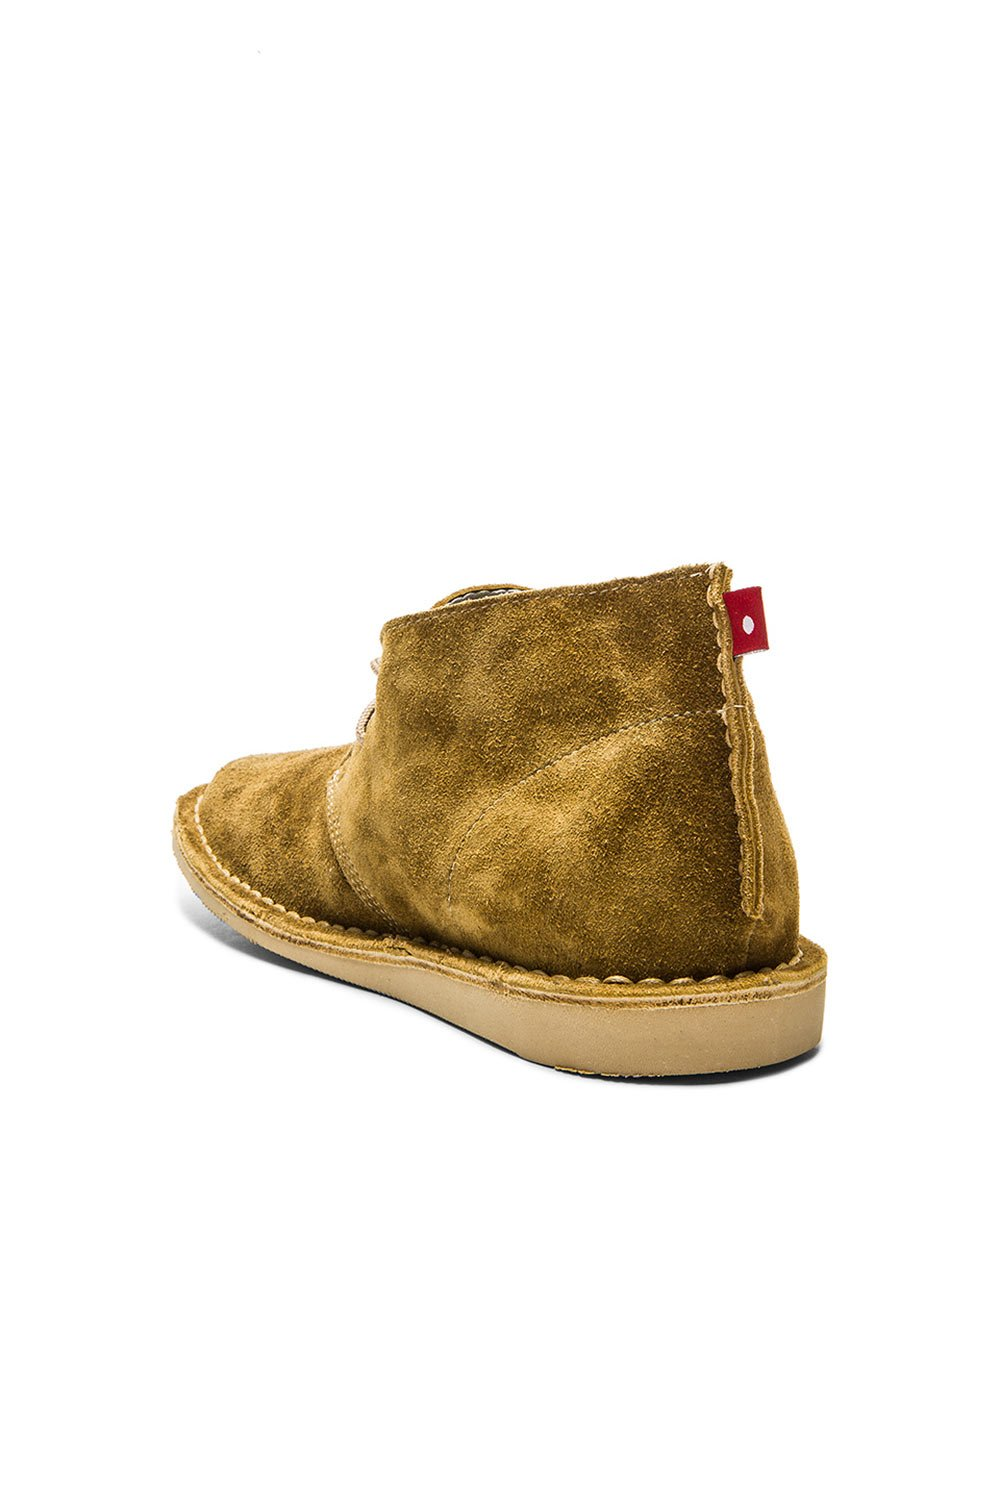 oliberte-x-mark-mcnairy-fair-trade-footwear-collection-7